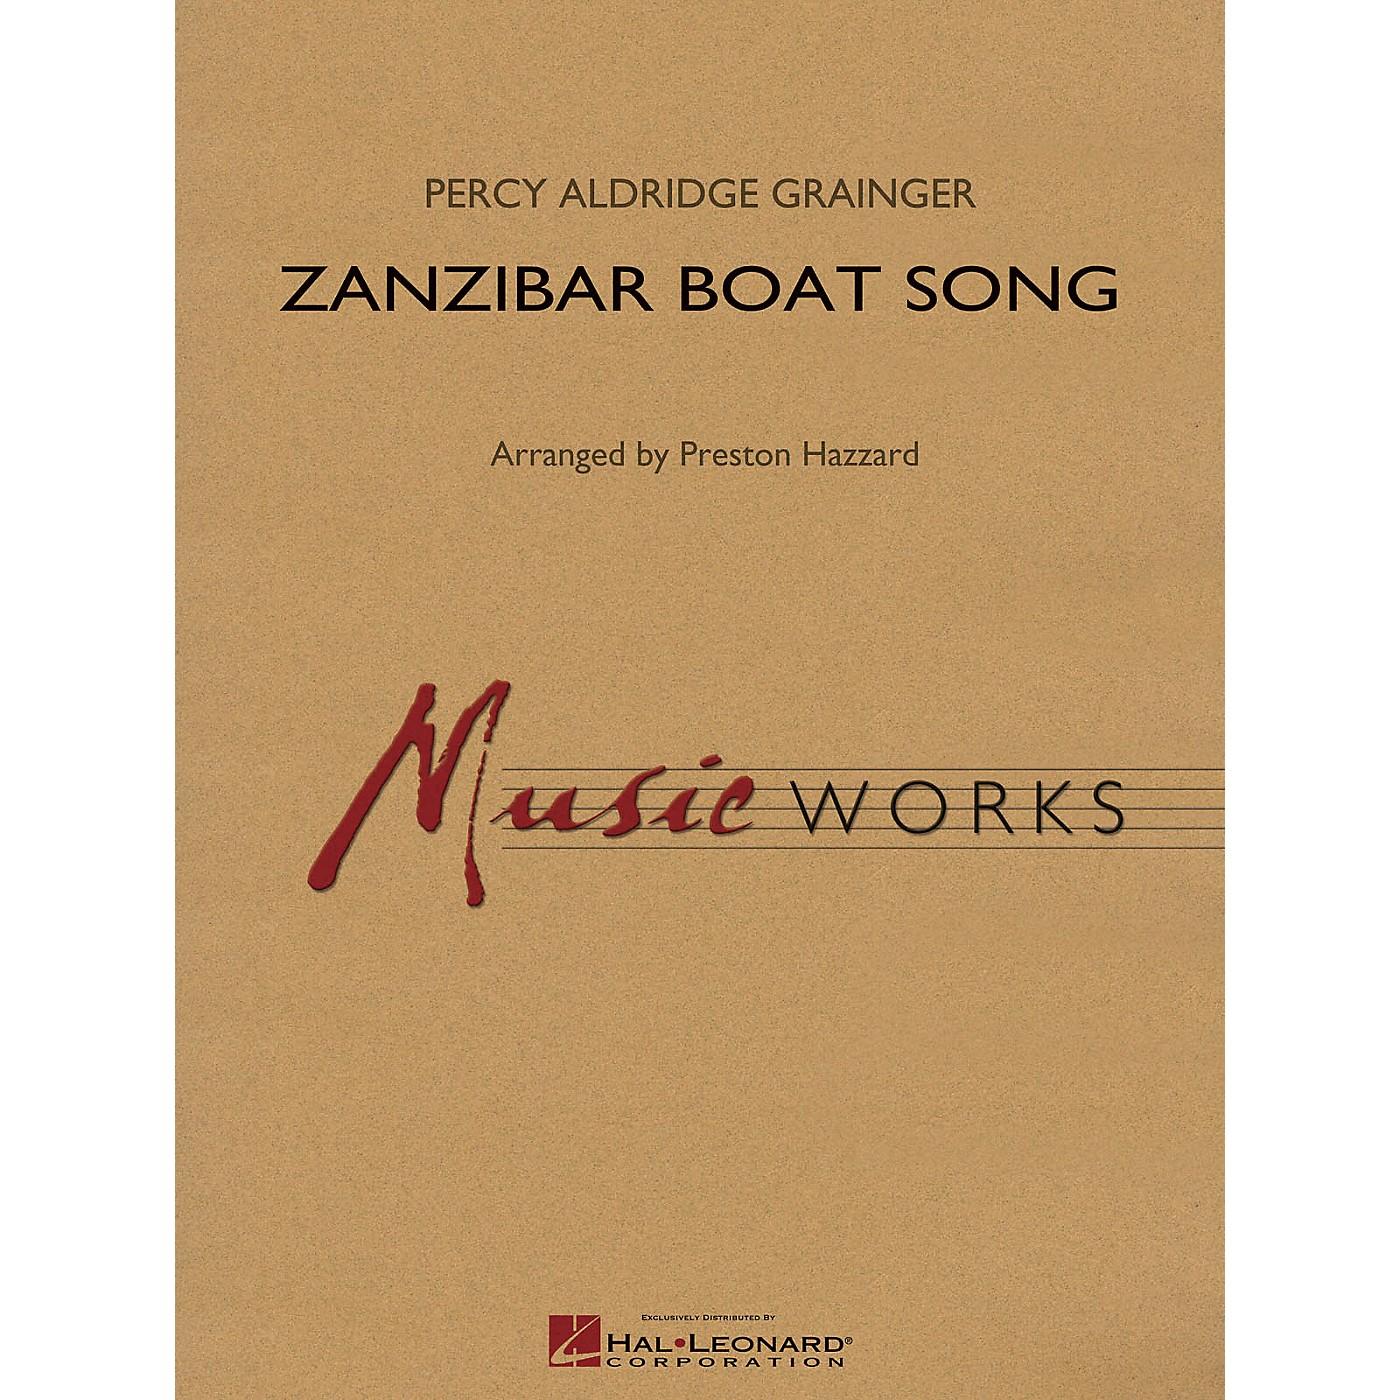 Hal Leonard Zanzibar Boat Song Concert Band Level 4 Arranged by Preston Hazzard thumbnail